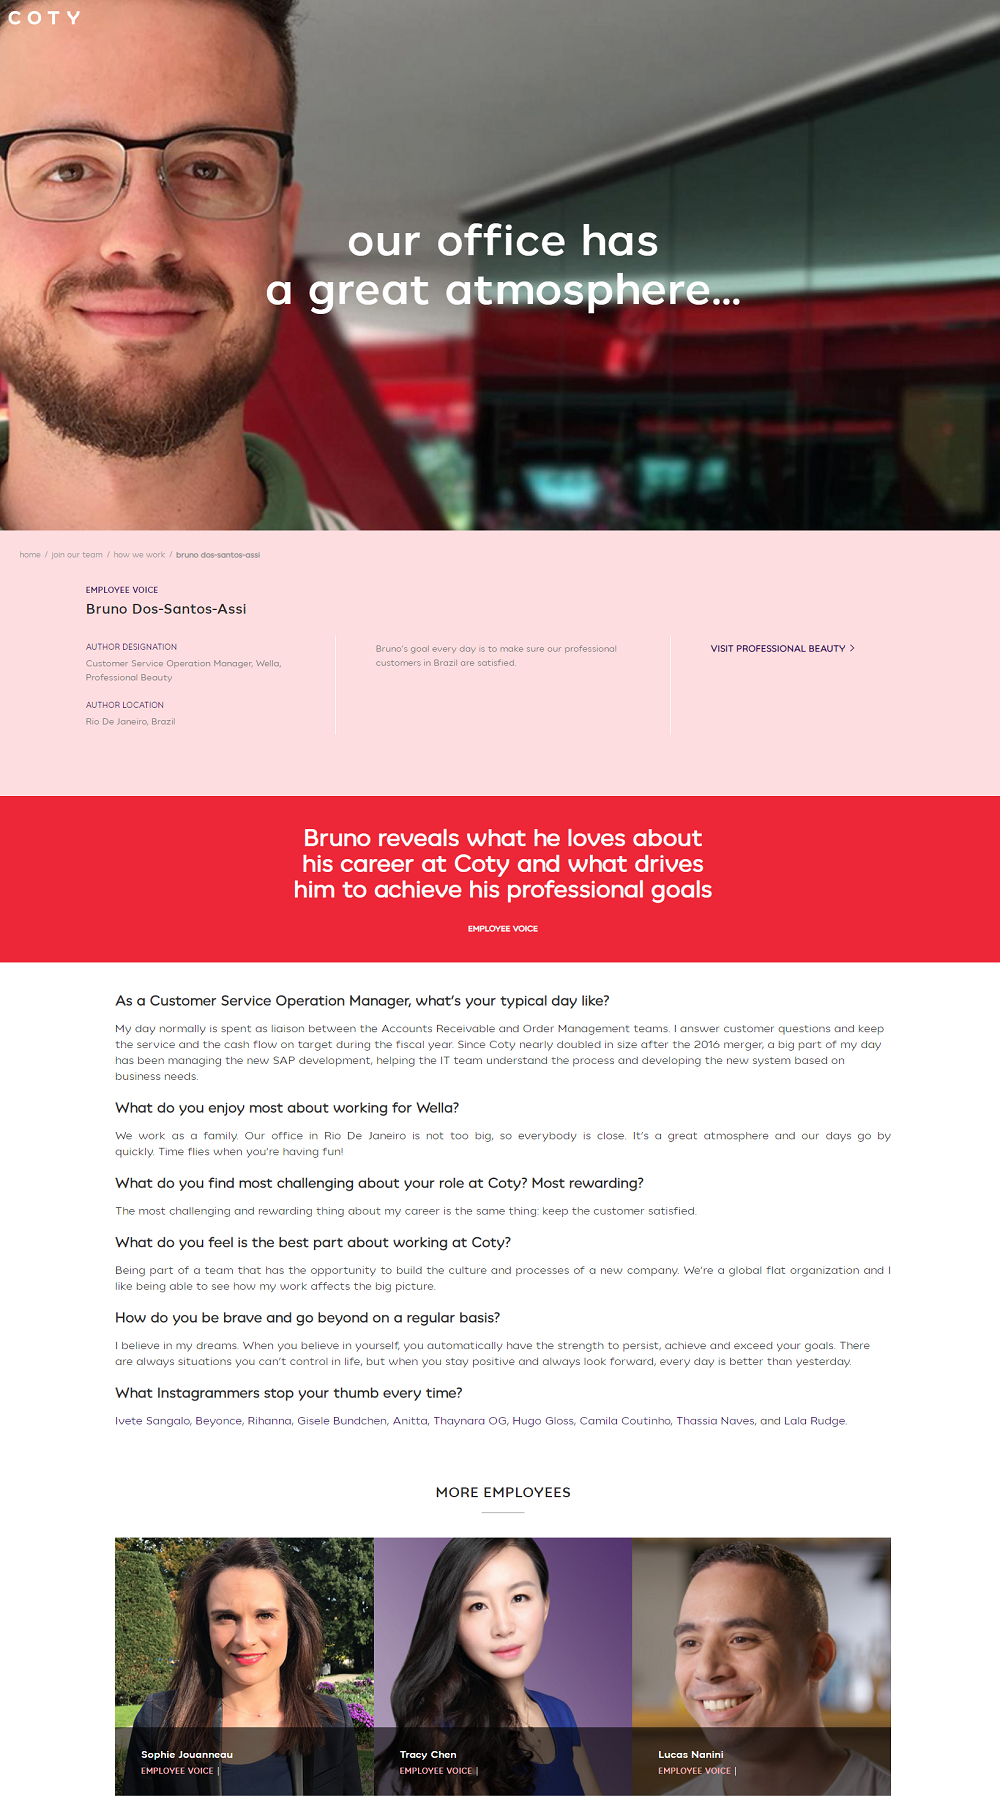 coty employee testimonial example